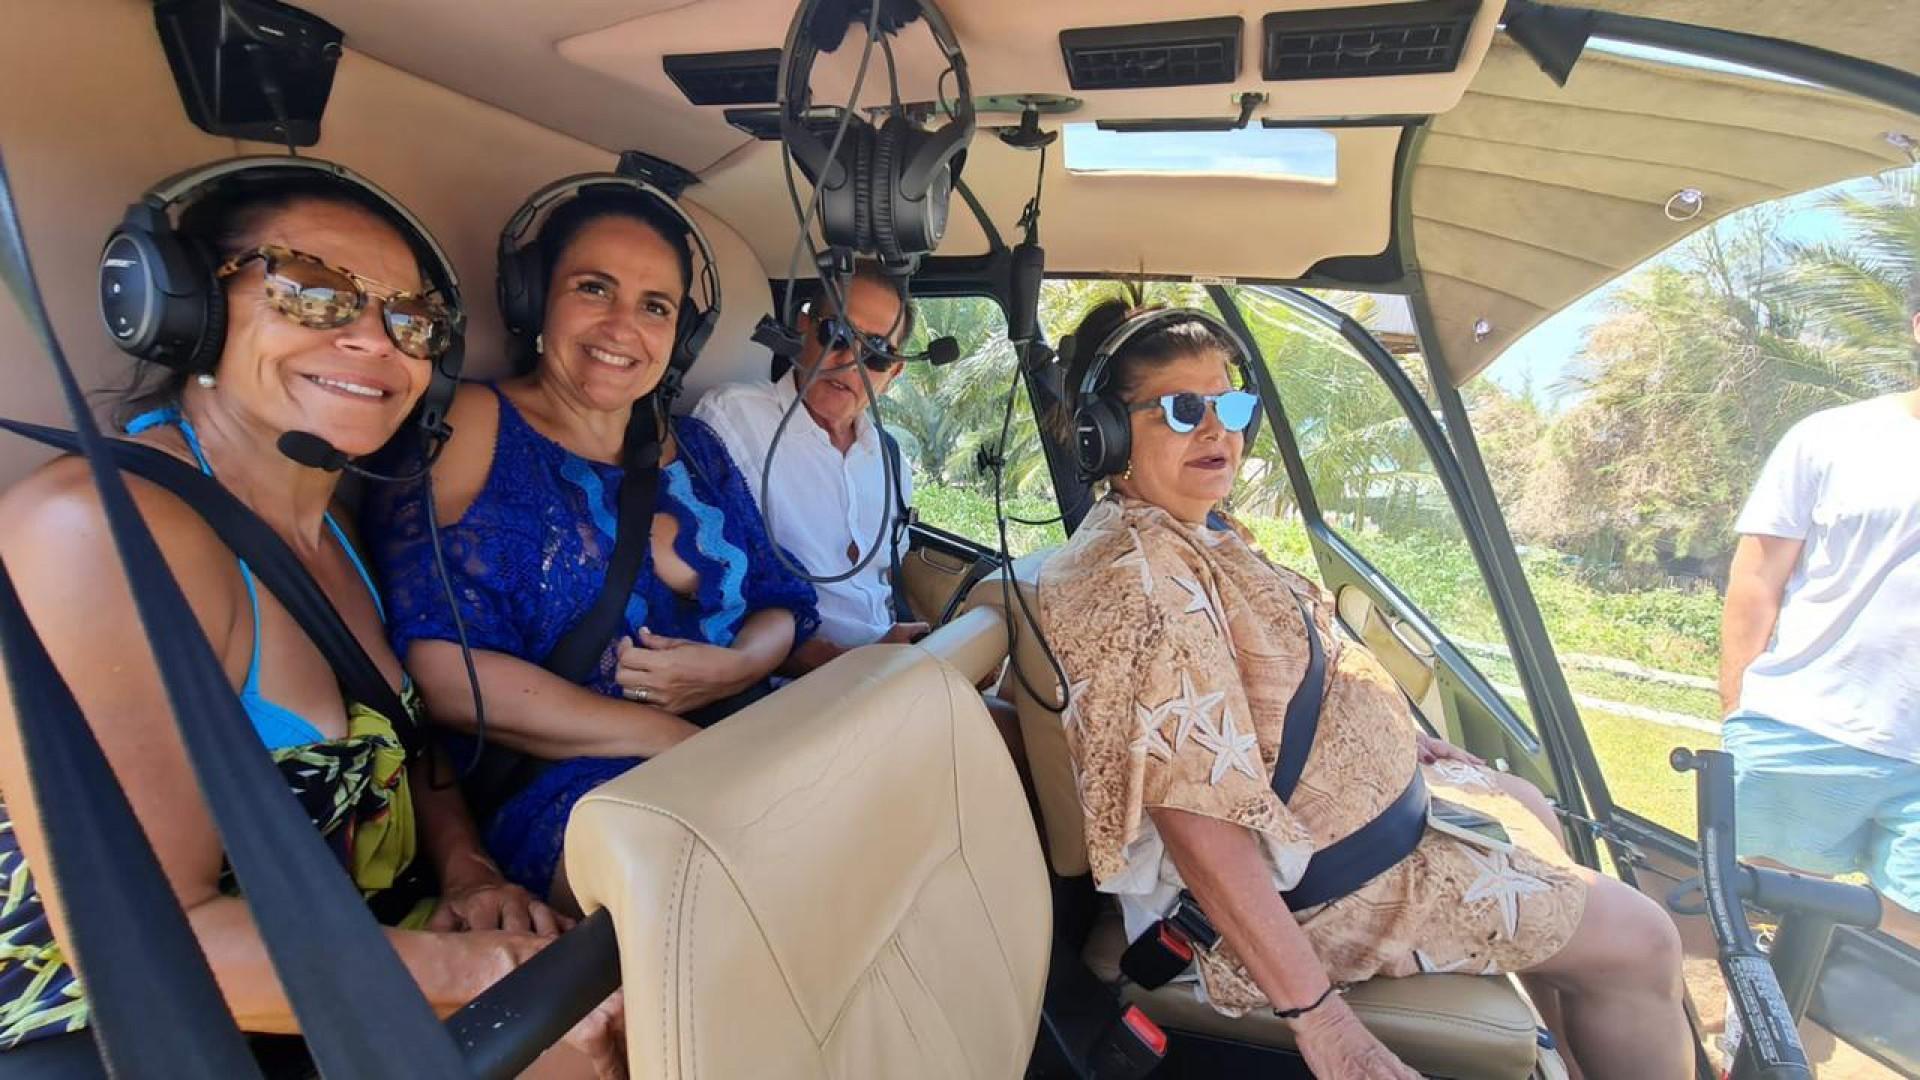 Maria Fernanda Teixeira, Sonia Hess, João Fiúza e Luiza Helena Trajano